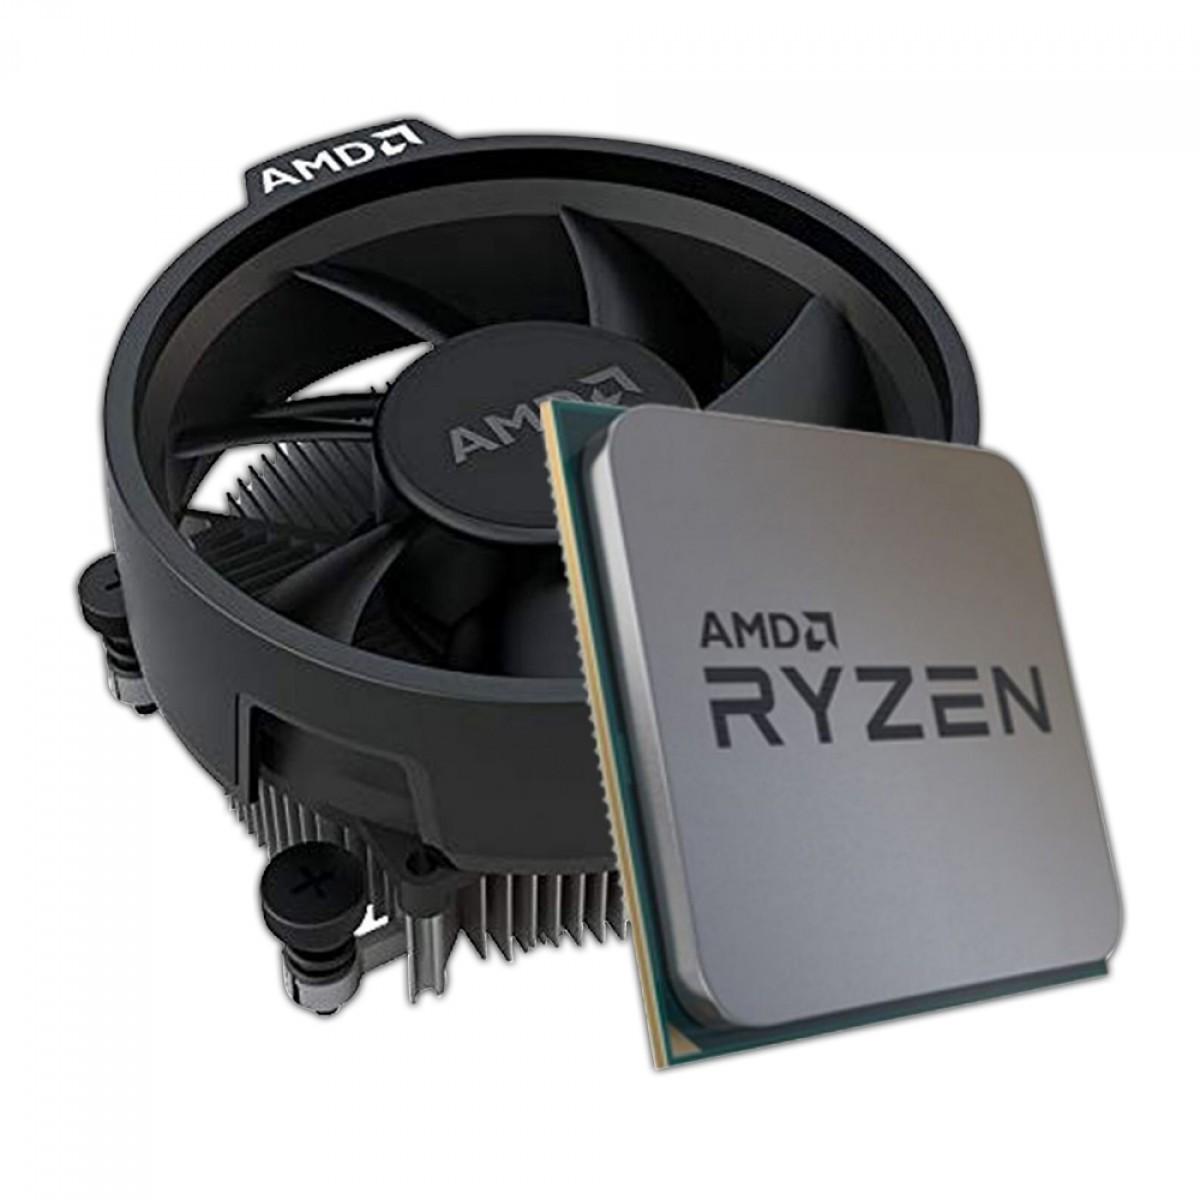 Kit Upgrade Gigabyte B450 AORUS M + AMD Ryzen 3 3300X 3.8GHz